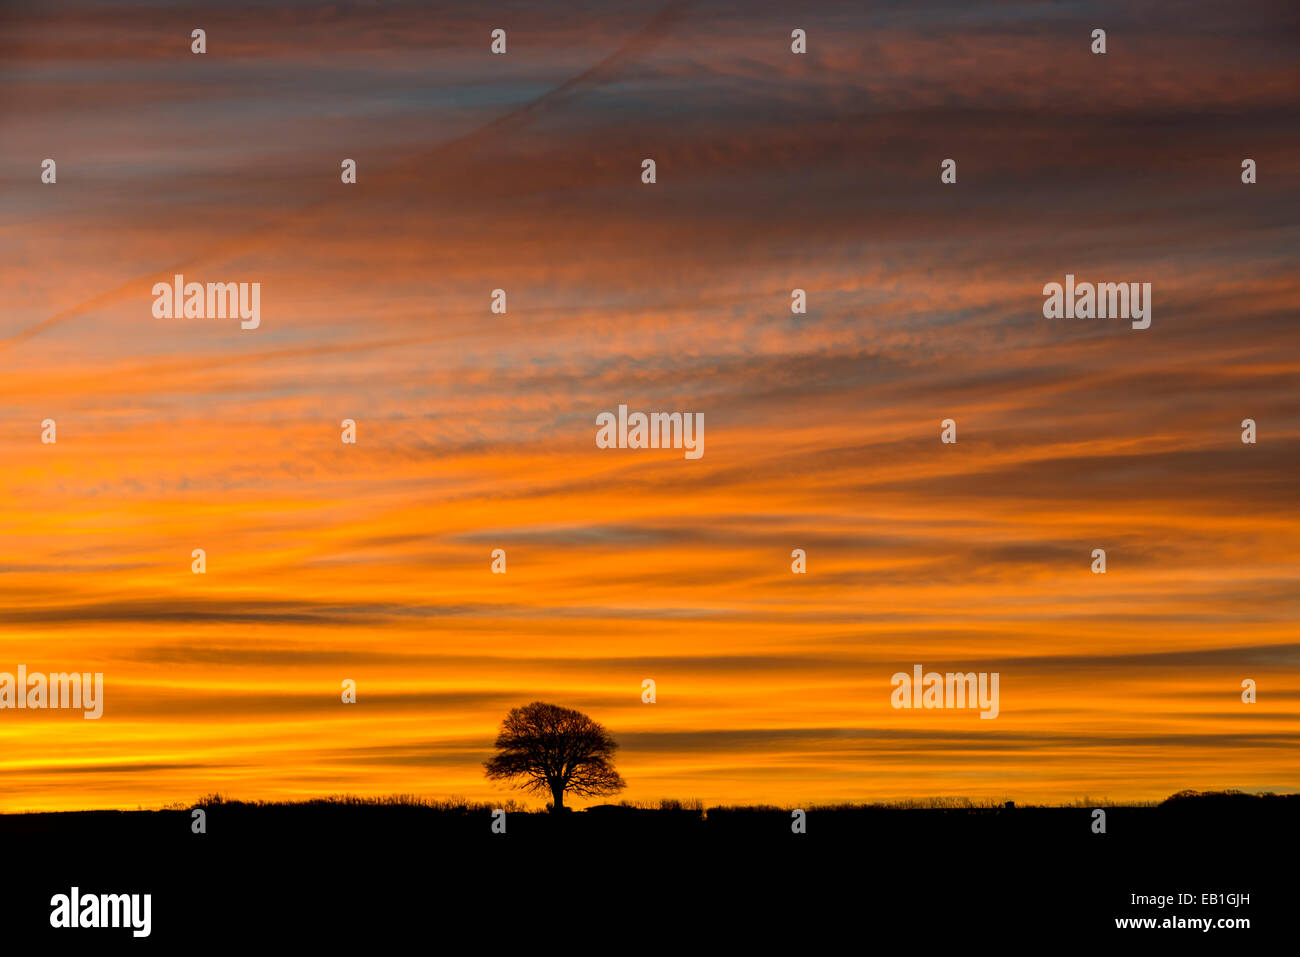 Magnificent orange pattern skies across Exmoor resembling an artist's canvas as temperatures reach below zero. - Stock Image